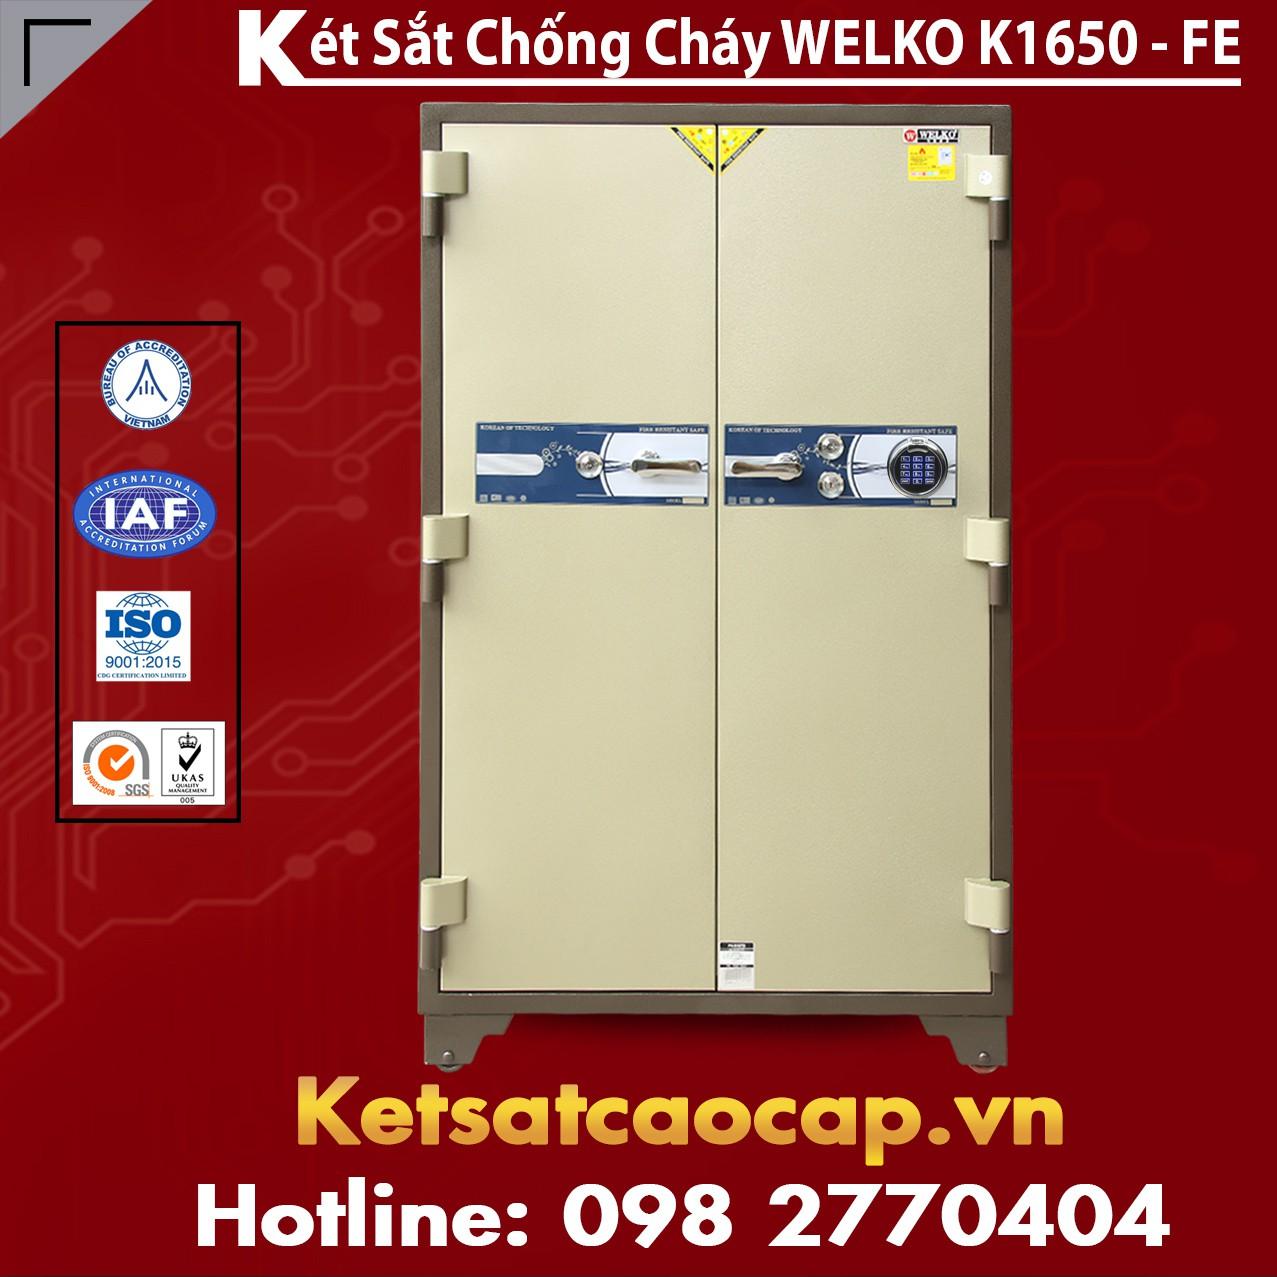 Két Sắt Chống Cháy Welko K1650 - FE